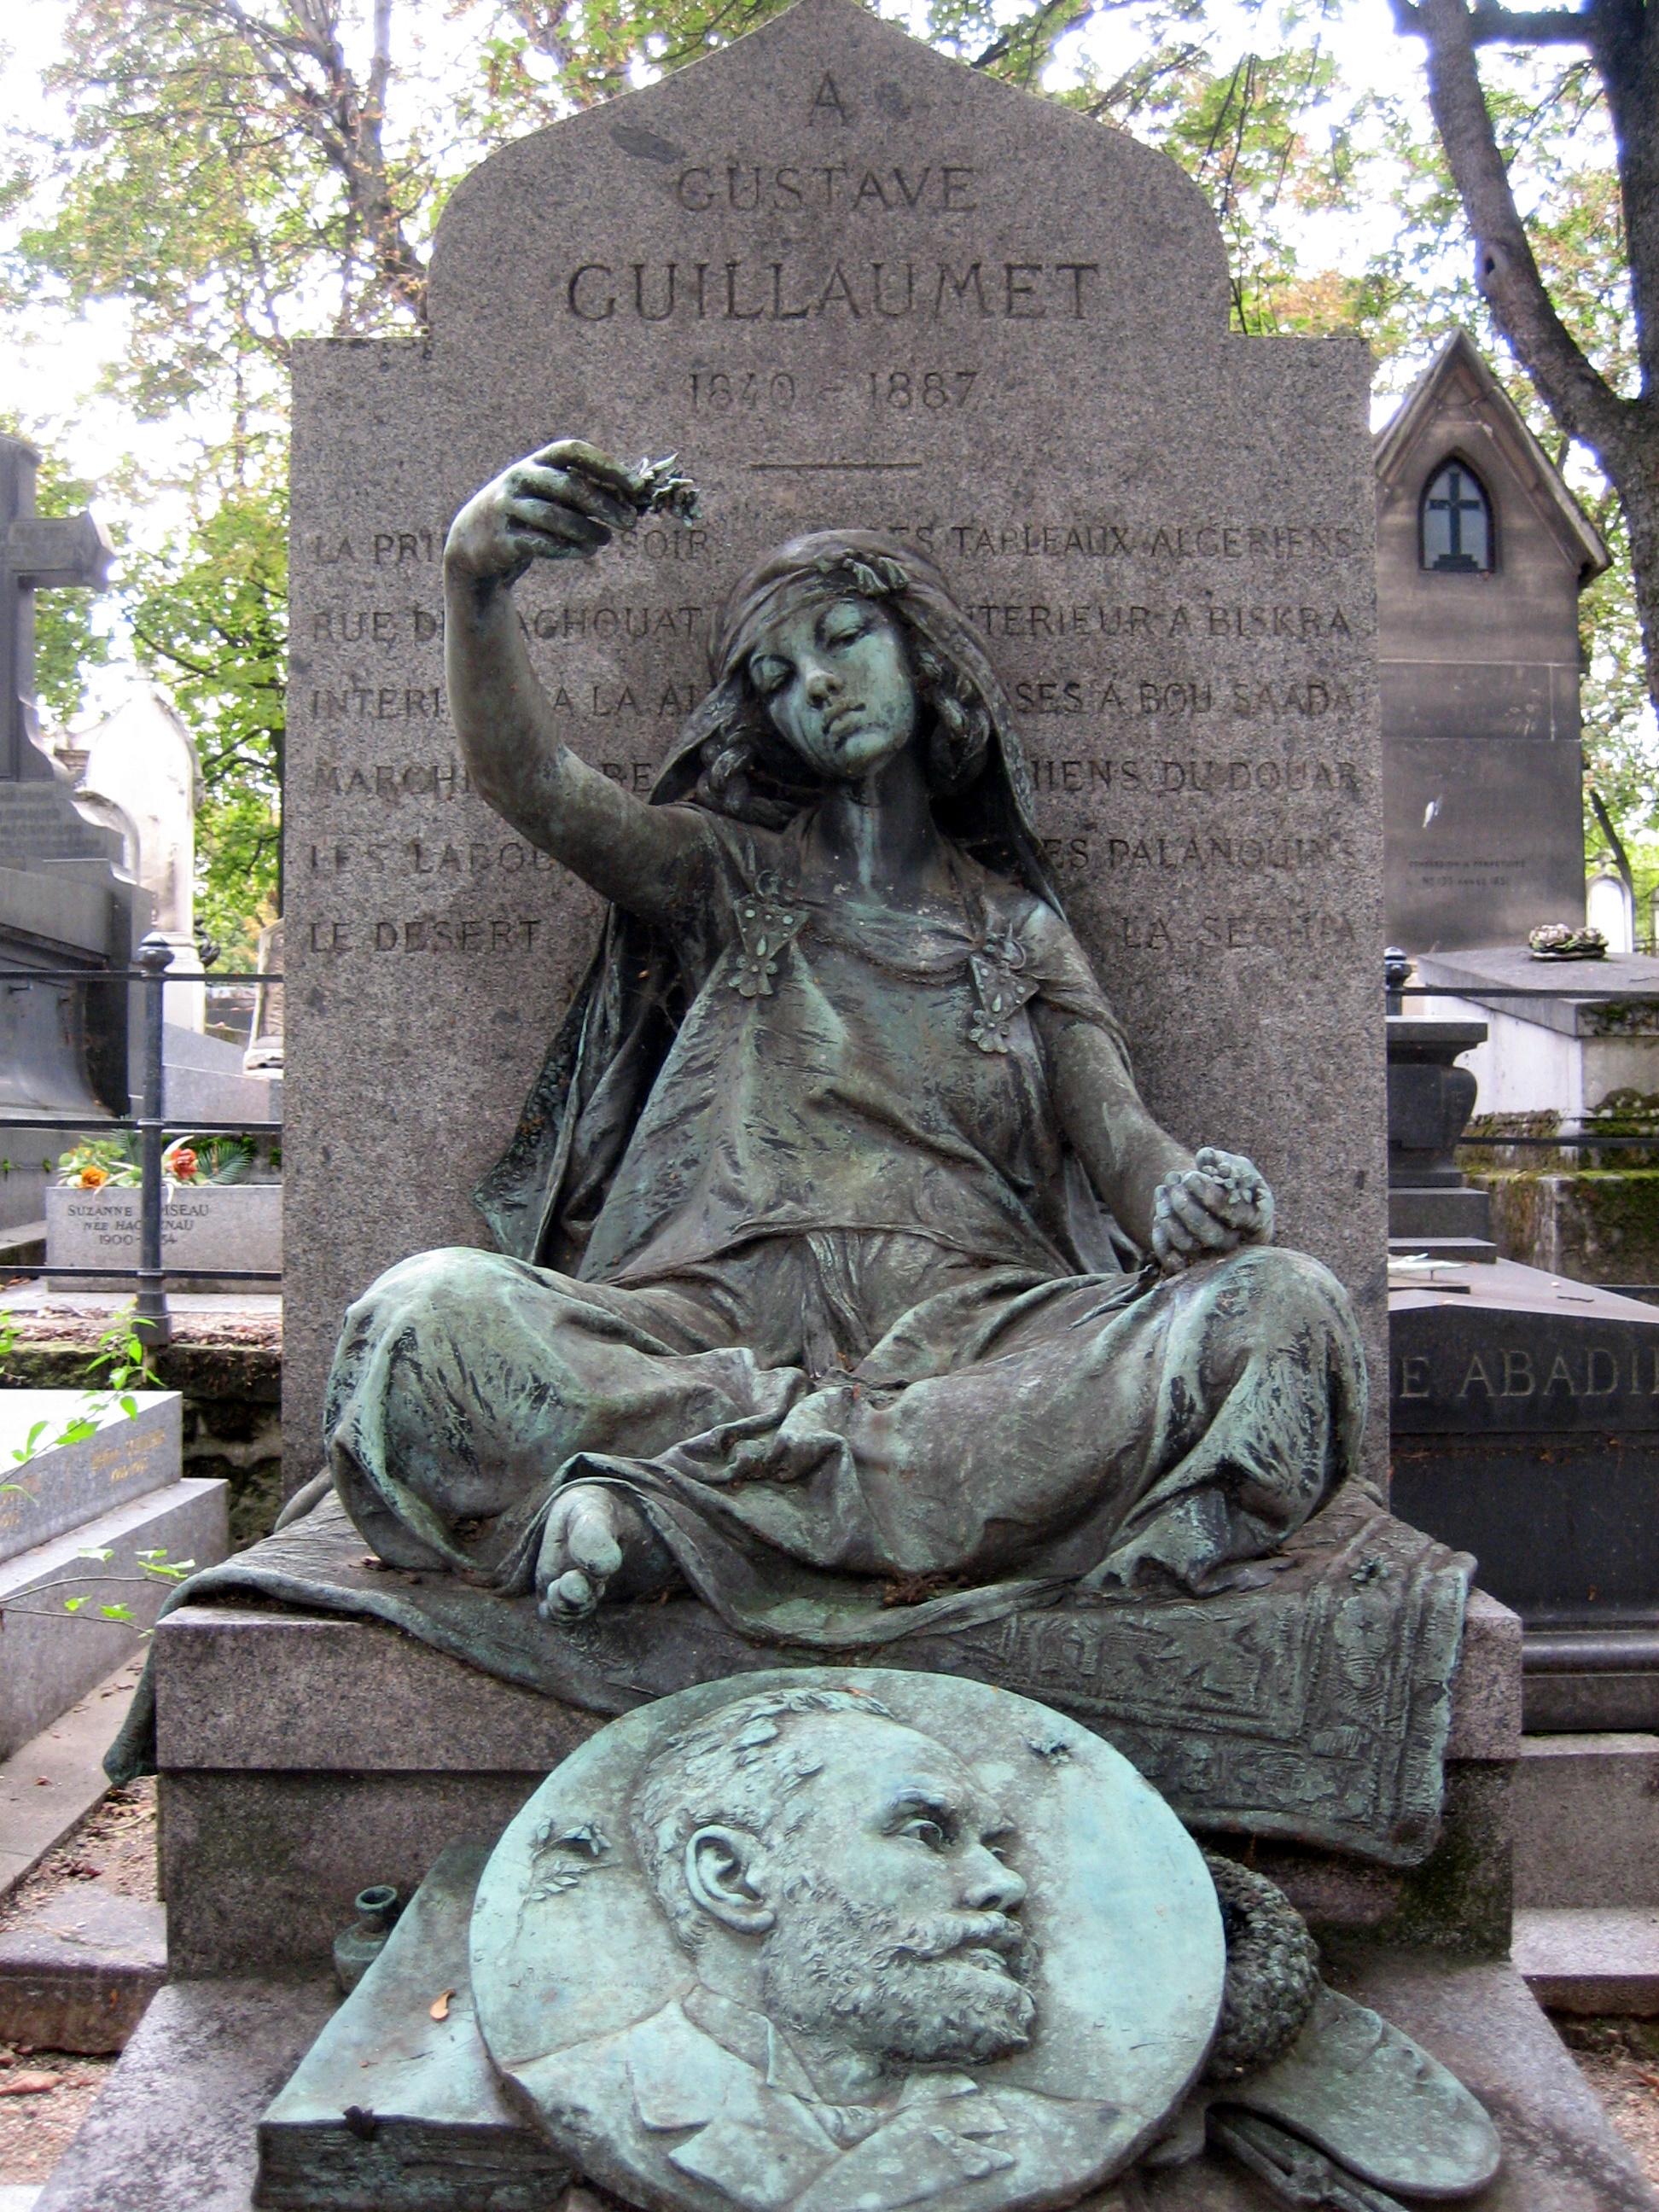 Figure 10. LouisErnestBarrias, Tomb of Gustave Guillaumet, 1890, Montparnasse Cemetery, Paris.